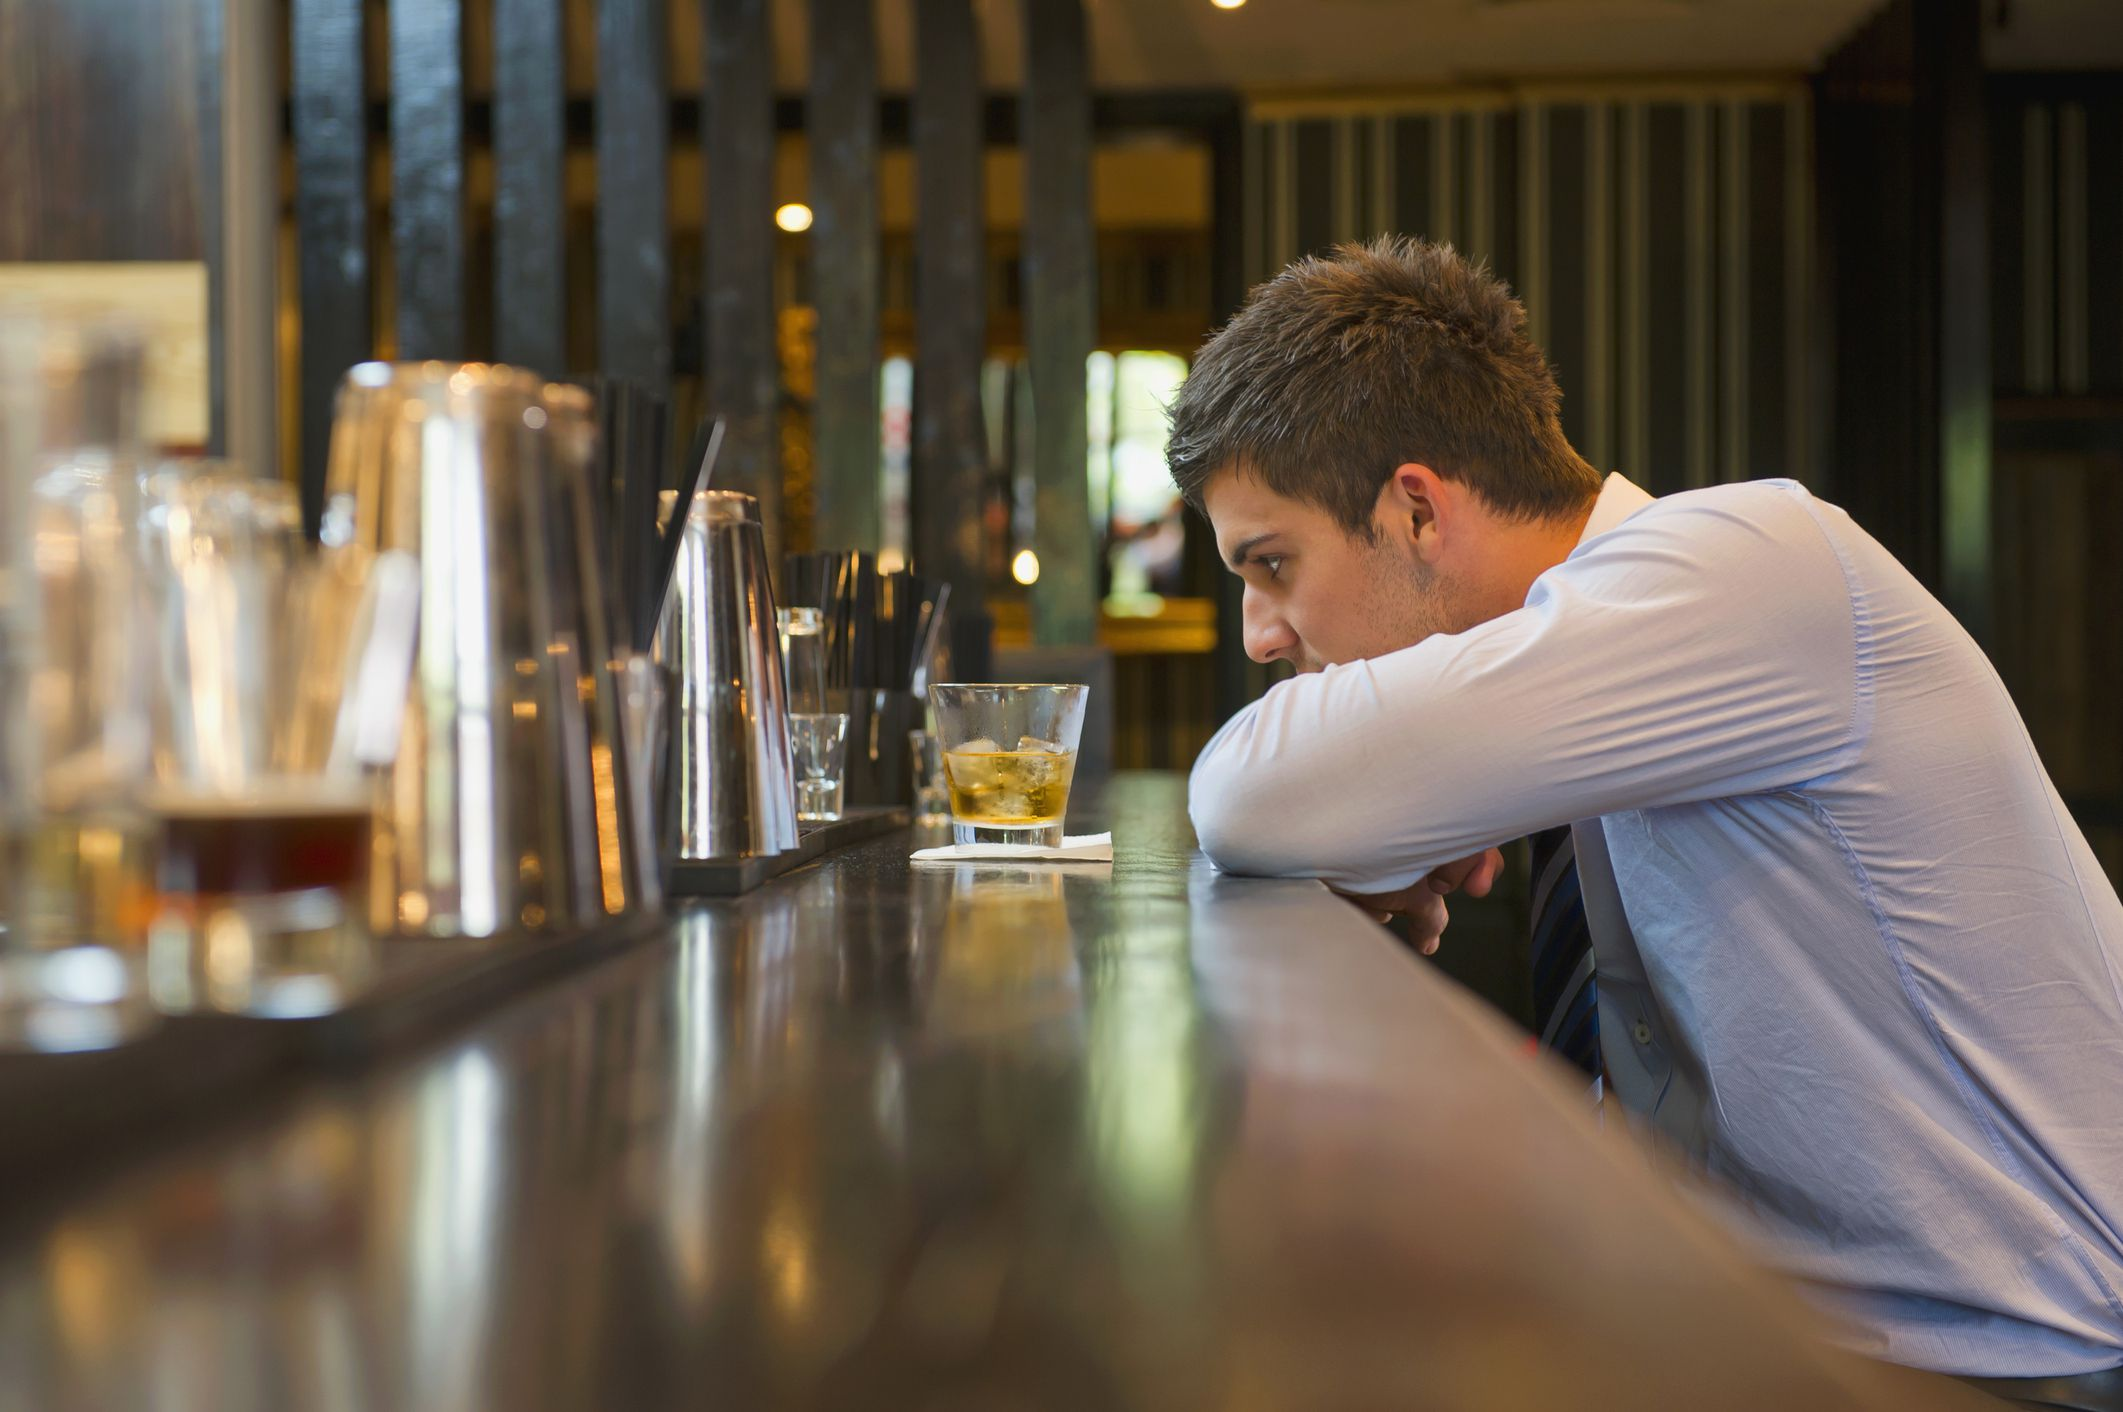 Behaviors That Can Make Addicts Dangerous